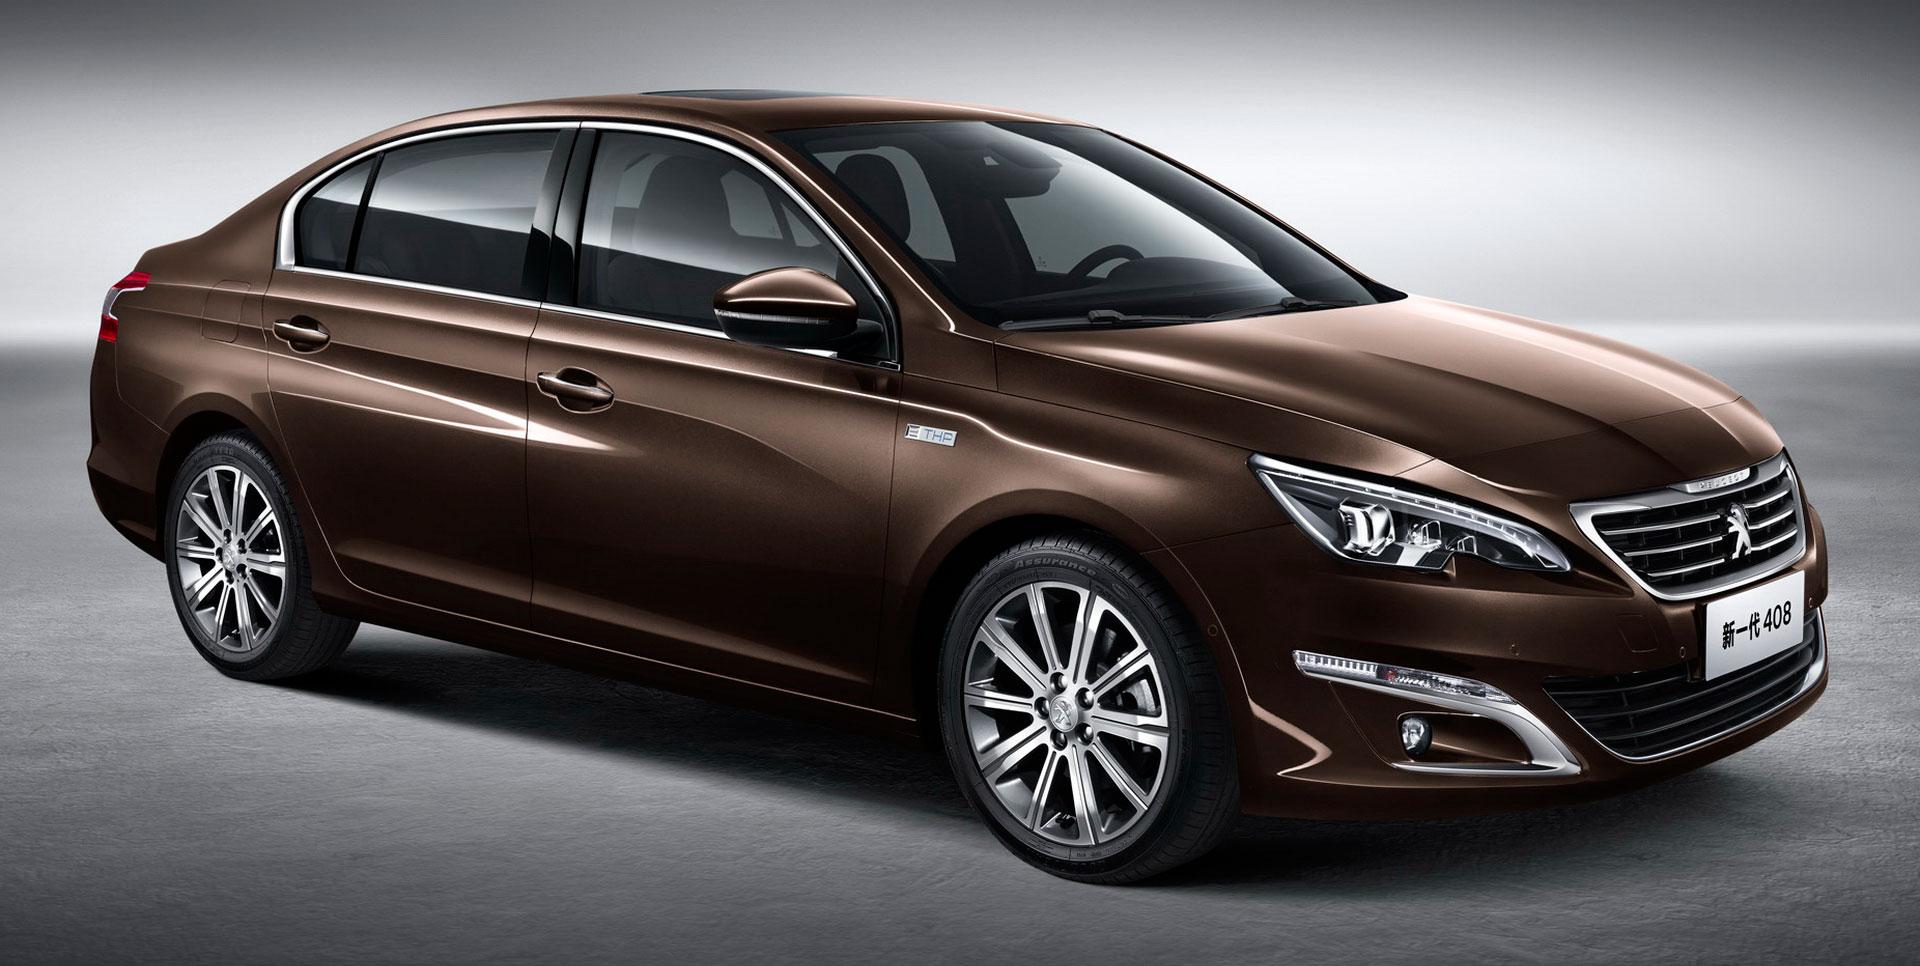 New Peugeot 408 Sedan Unveiled At Auto China 2014 Image 243419